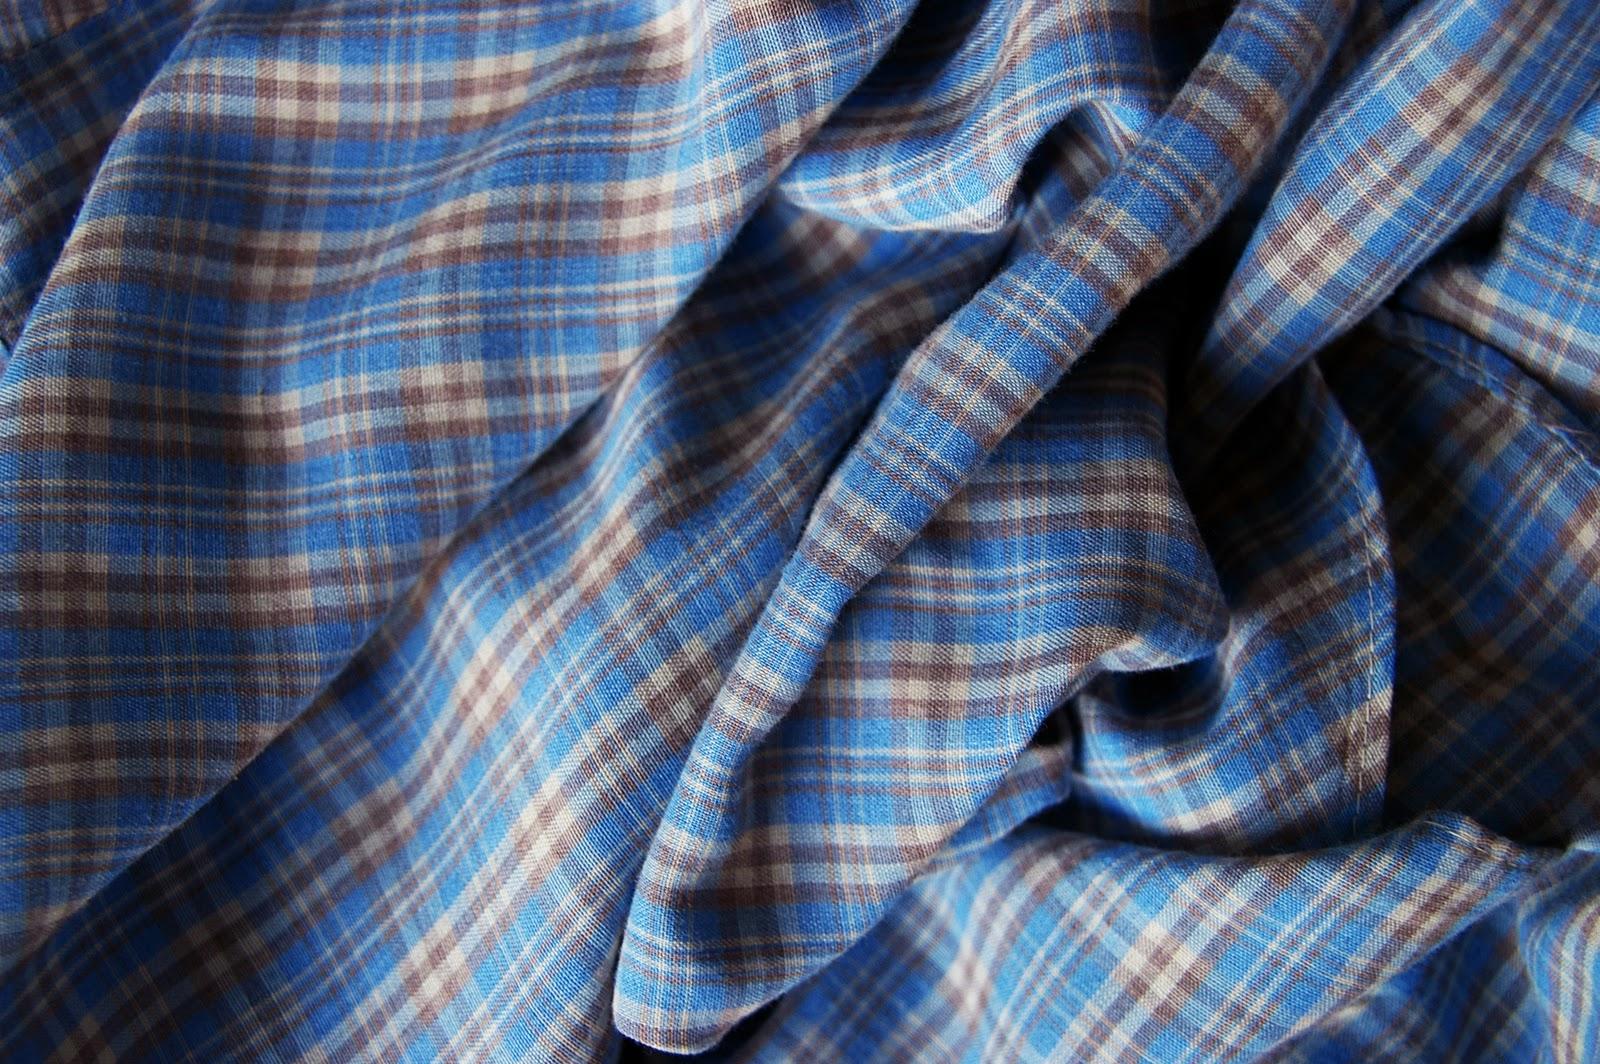 http://2.bp.blogspot.com/_5YQzFd7SgnI/TPY2kvBUIzI/AAAAAAAAAnM/DImVXlNBd-4/s1600/fudgegraphics-creased-fabric-01.jpg